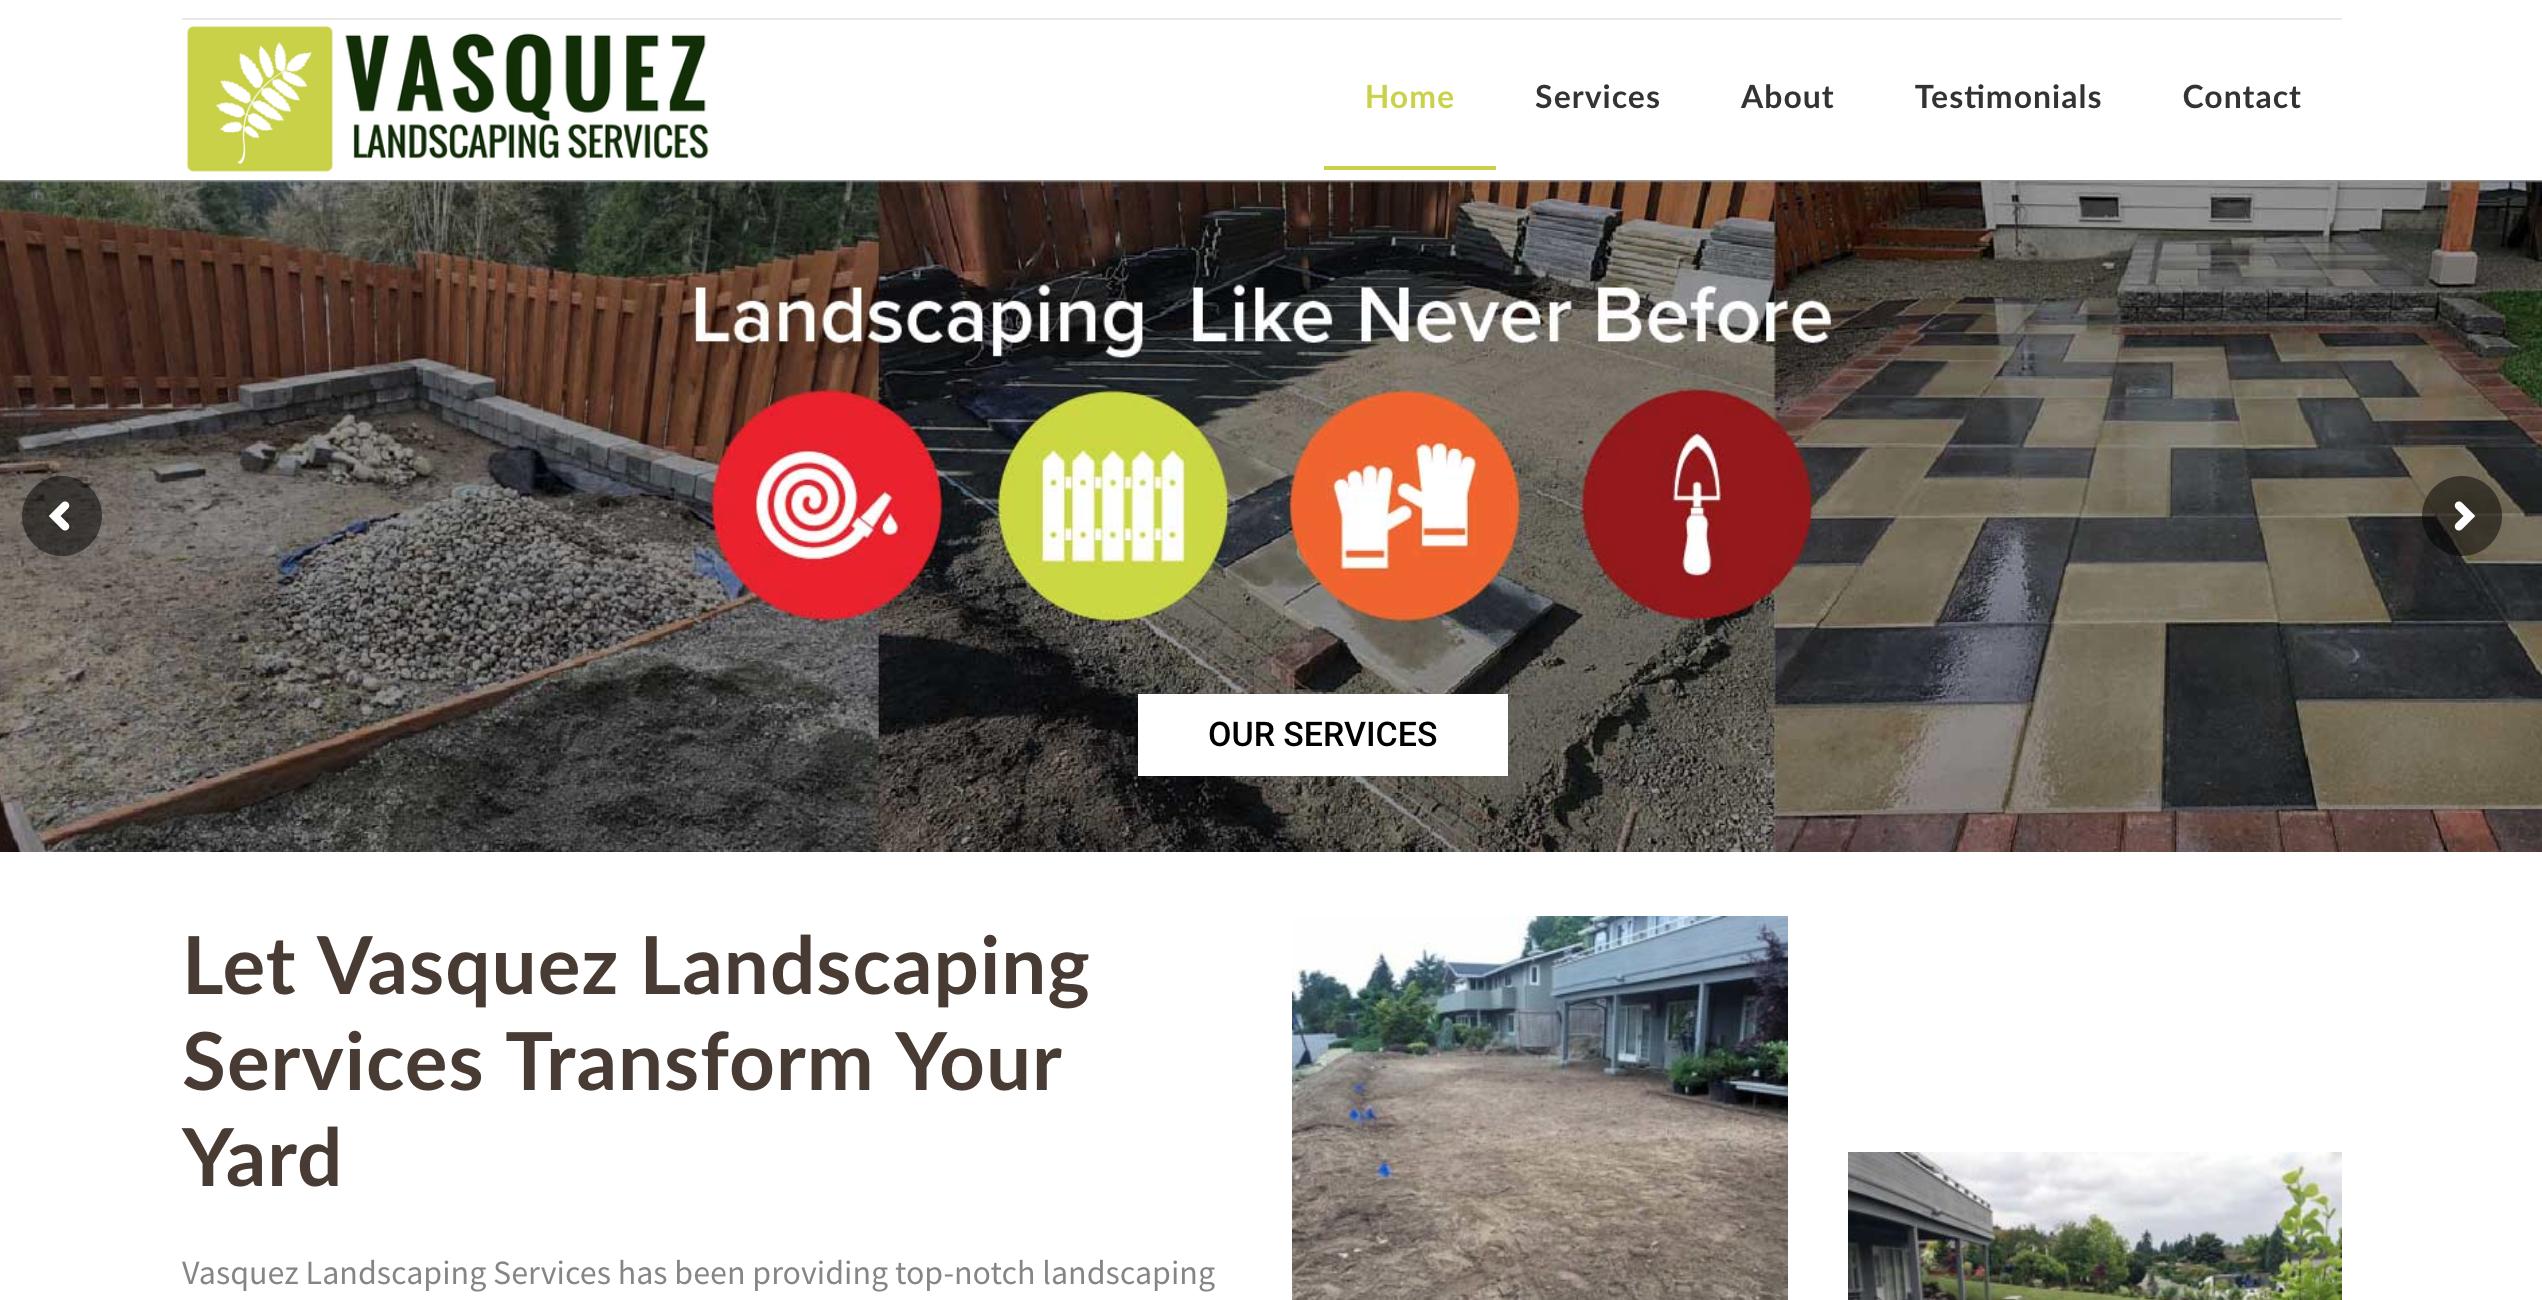 hillclimb-design-vasquez-landscaping-services